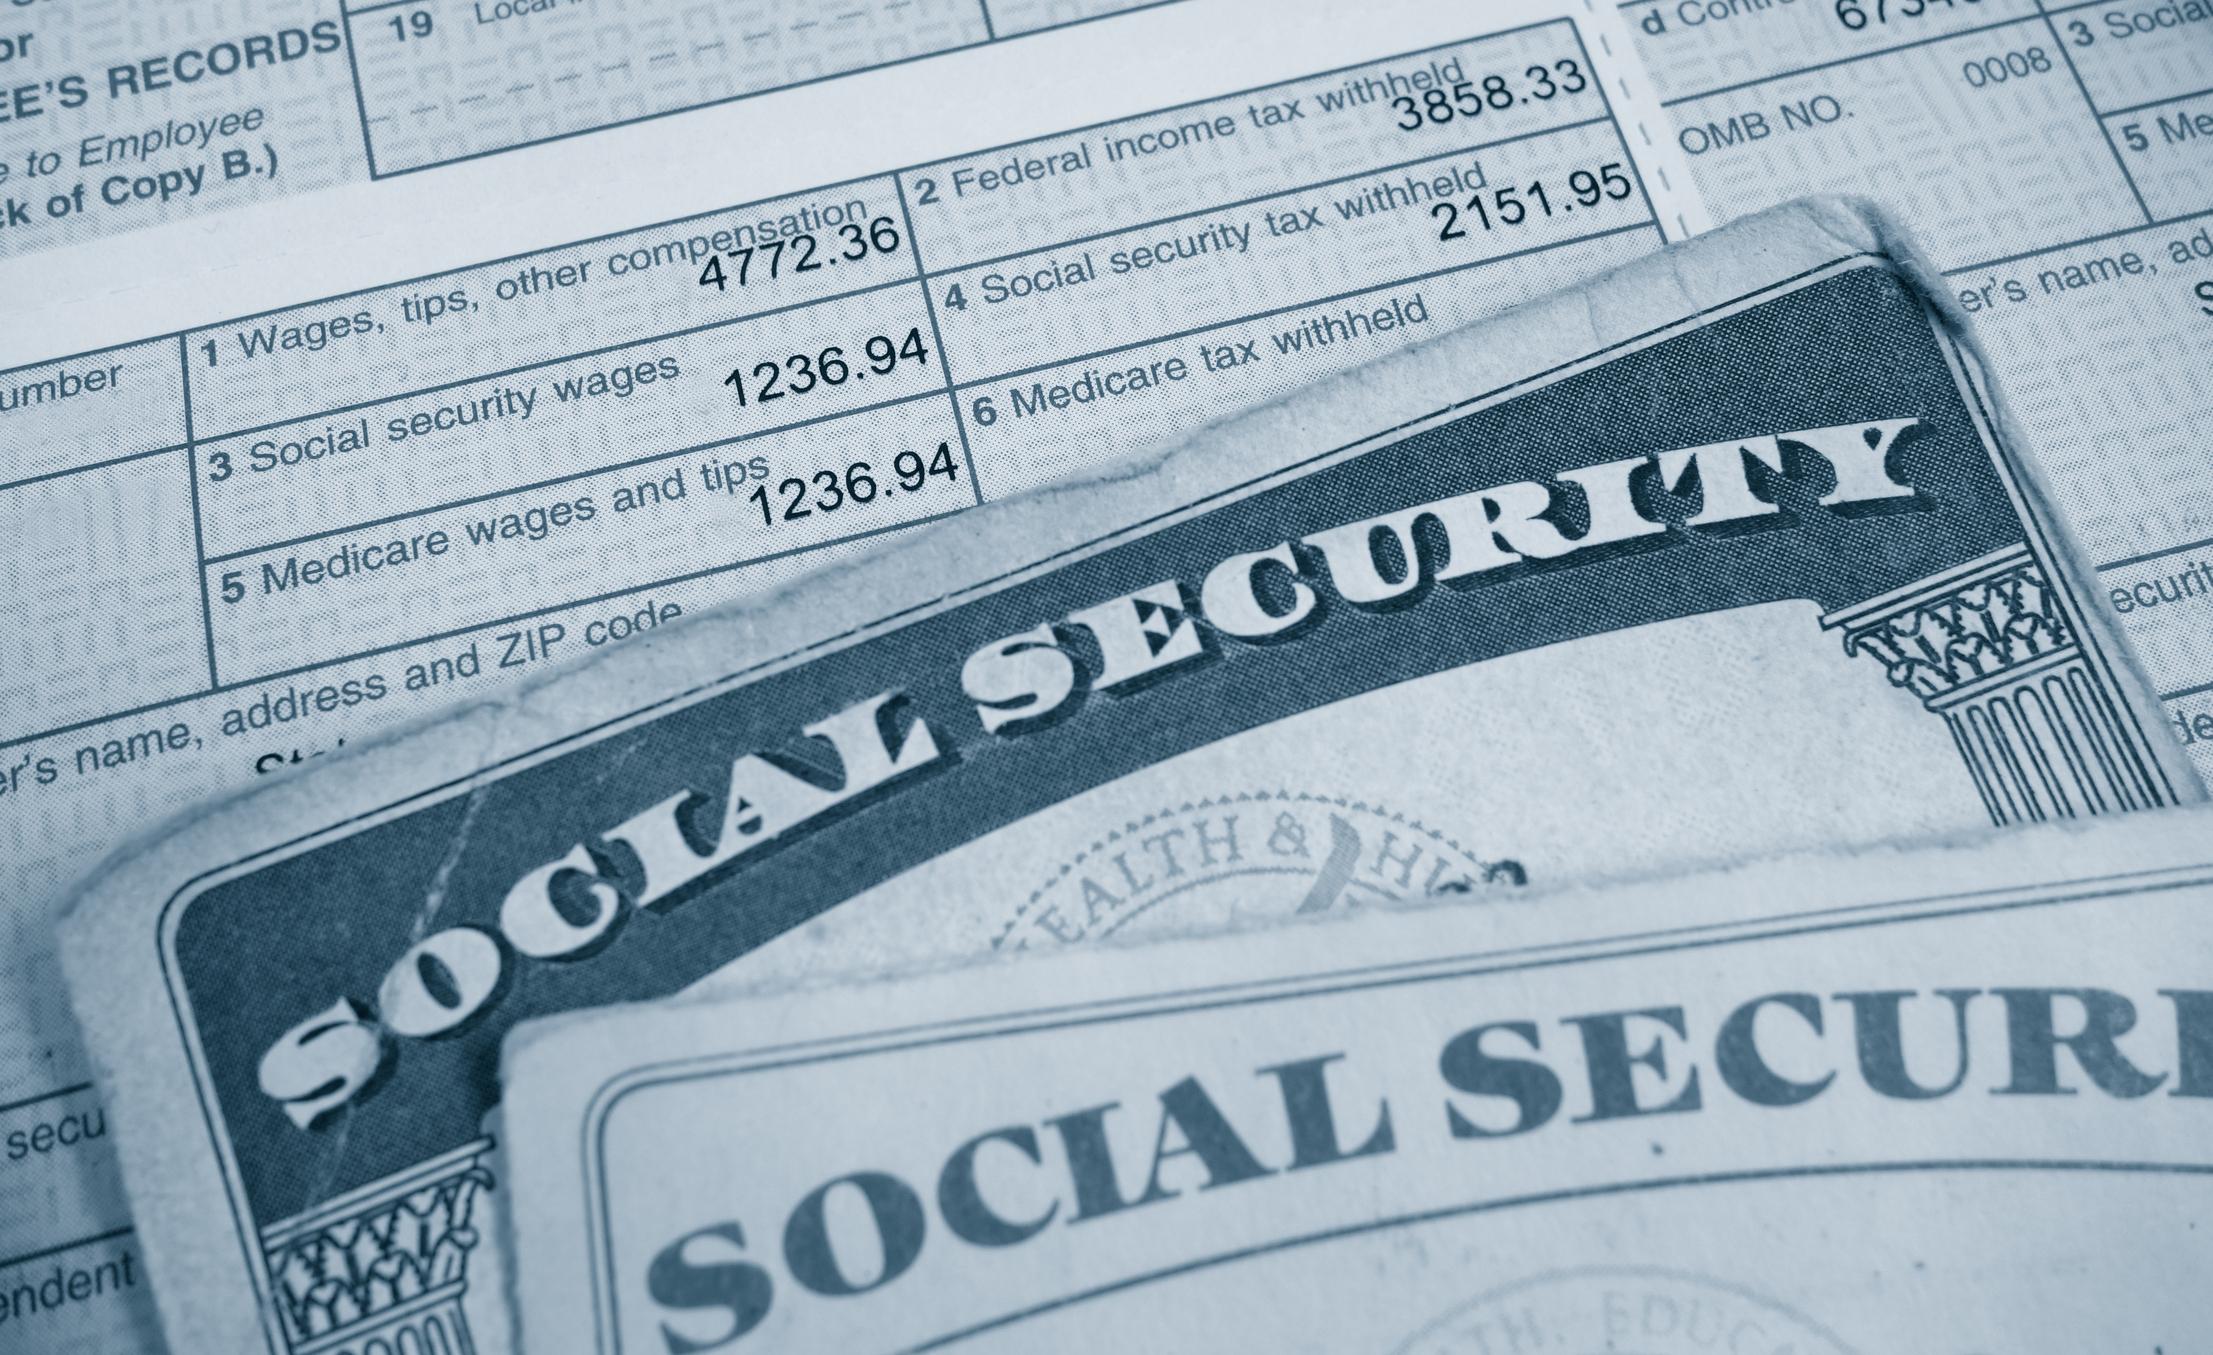 Social Security cards lying atop a pay stub, highlighting payroll taxes paid.